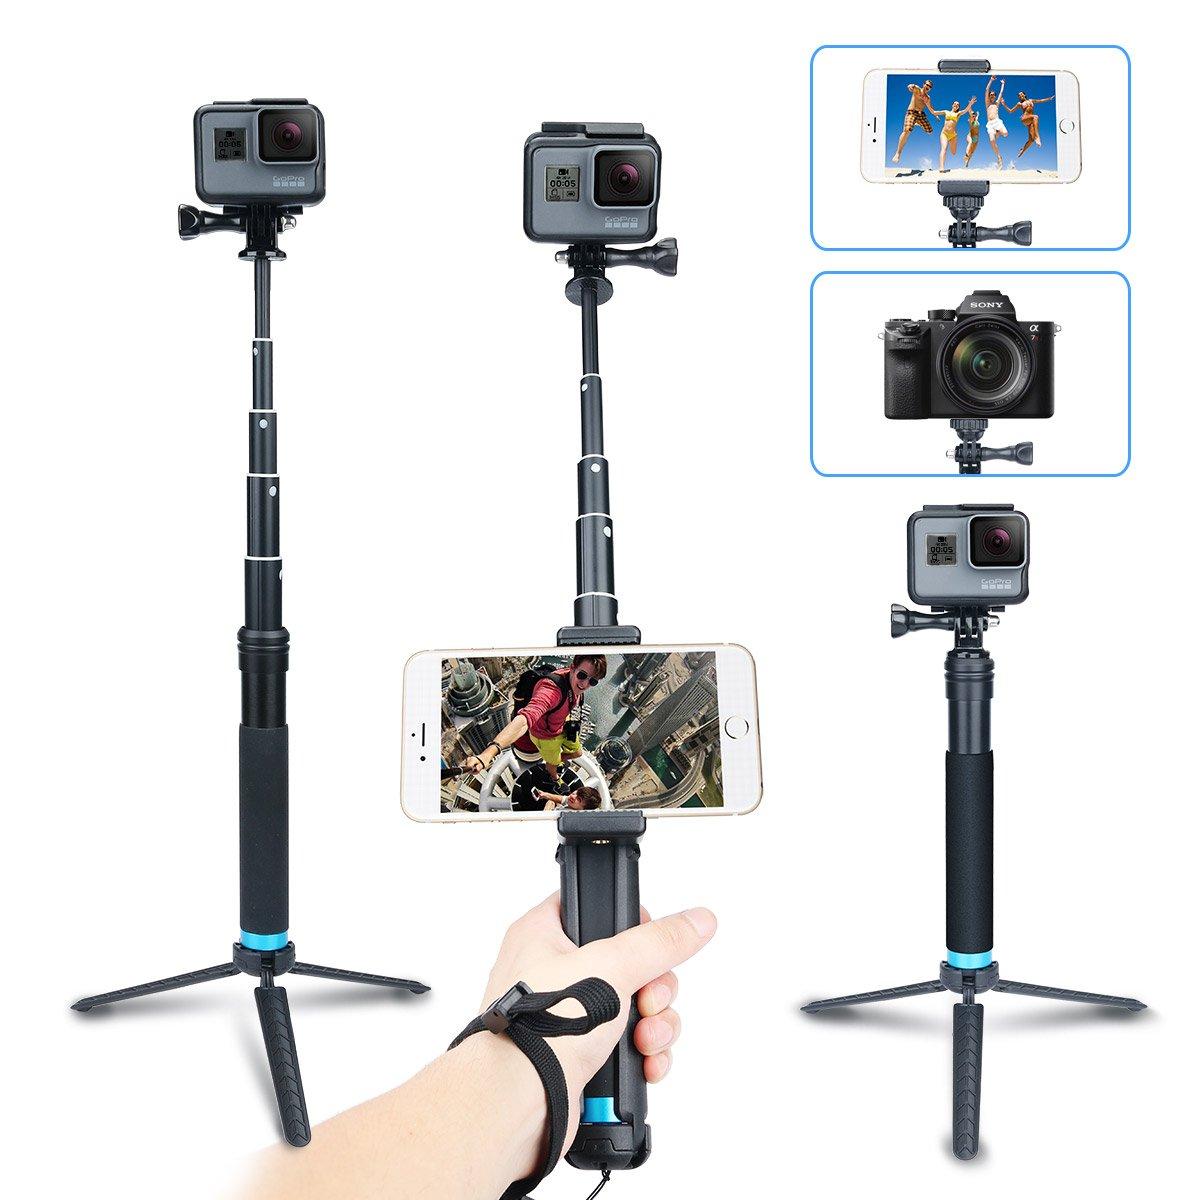 AFAITH Waterproof Selfie Stick Aluminum Alloy Hand Grip Telescopic Handheld Monopod for GoPro Hero 2018/6/5/4/3+, iPhone 7/7 Plus / 6s Plus / 6, Samsung Galaxy S8 Edge S7 S6 and Smartphones GP073